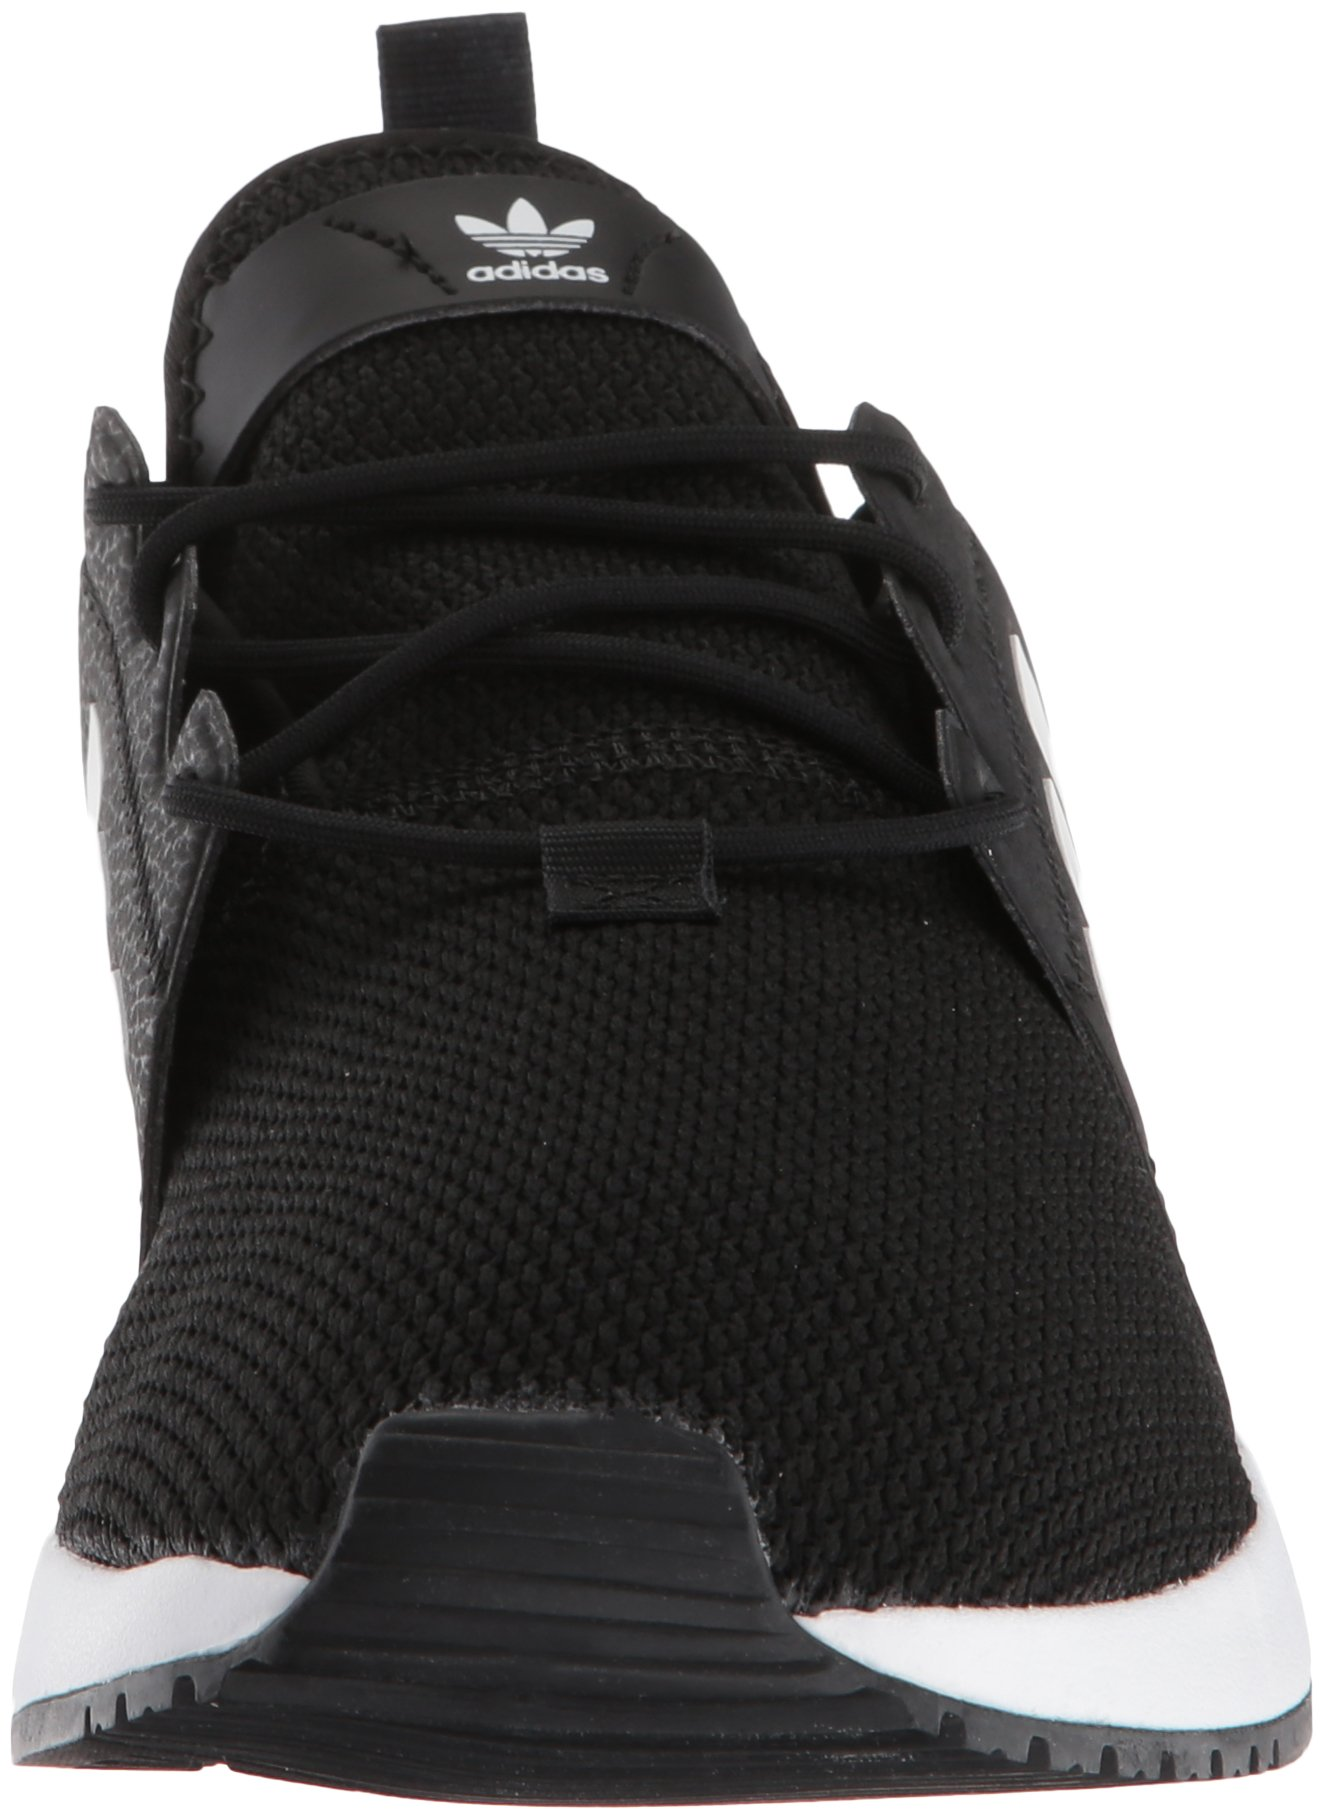 adidas Originals Mens X_PLR Running Shoe White/Black, 4.5 M US by adidas Originals (Image #4)